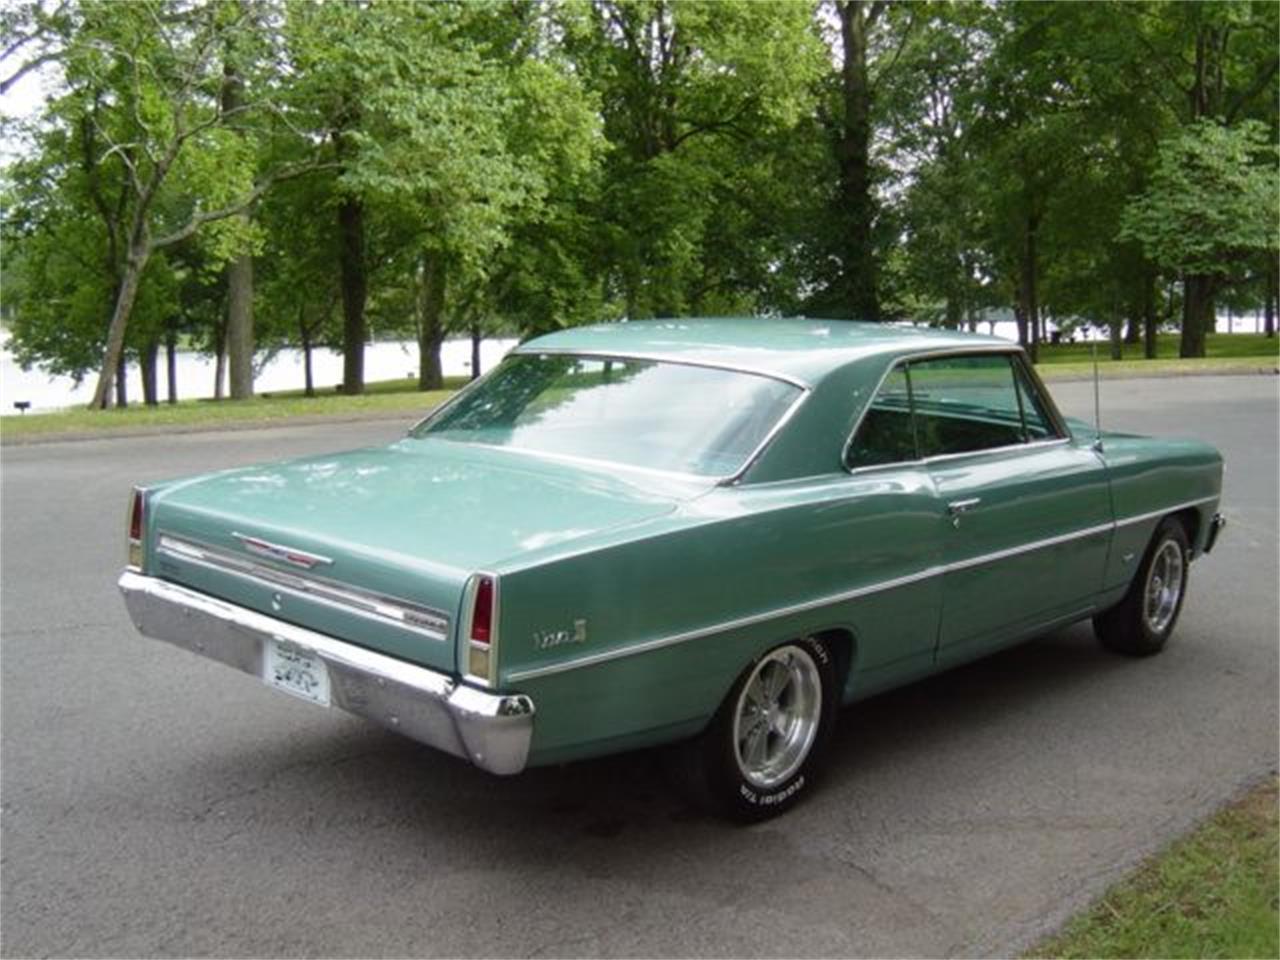 1966 Chevrolet Nova II (CC-1361401) for sale in Hendersonville, Tennessee